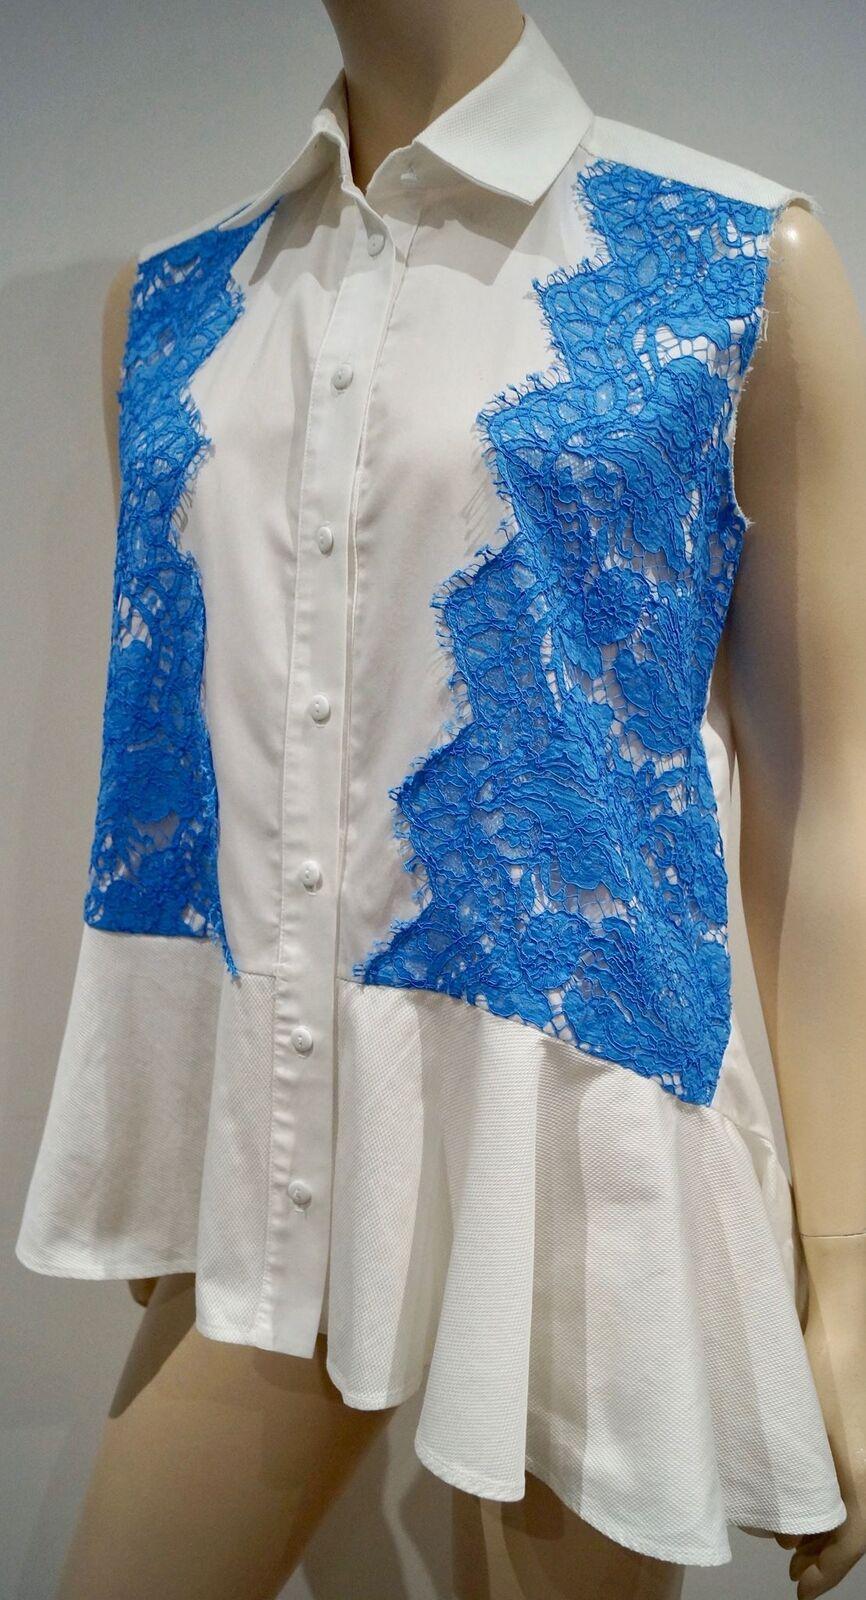 PREEN BY THORNTON BREGAZZI Weiß Cotton Poplin Blau Lace Sleeveless Shirt Top M